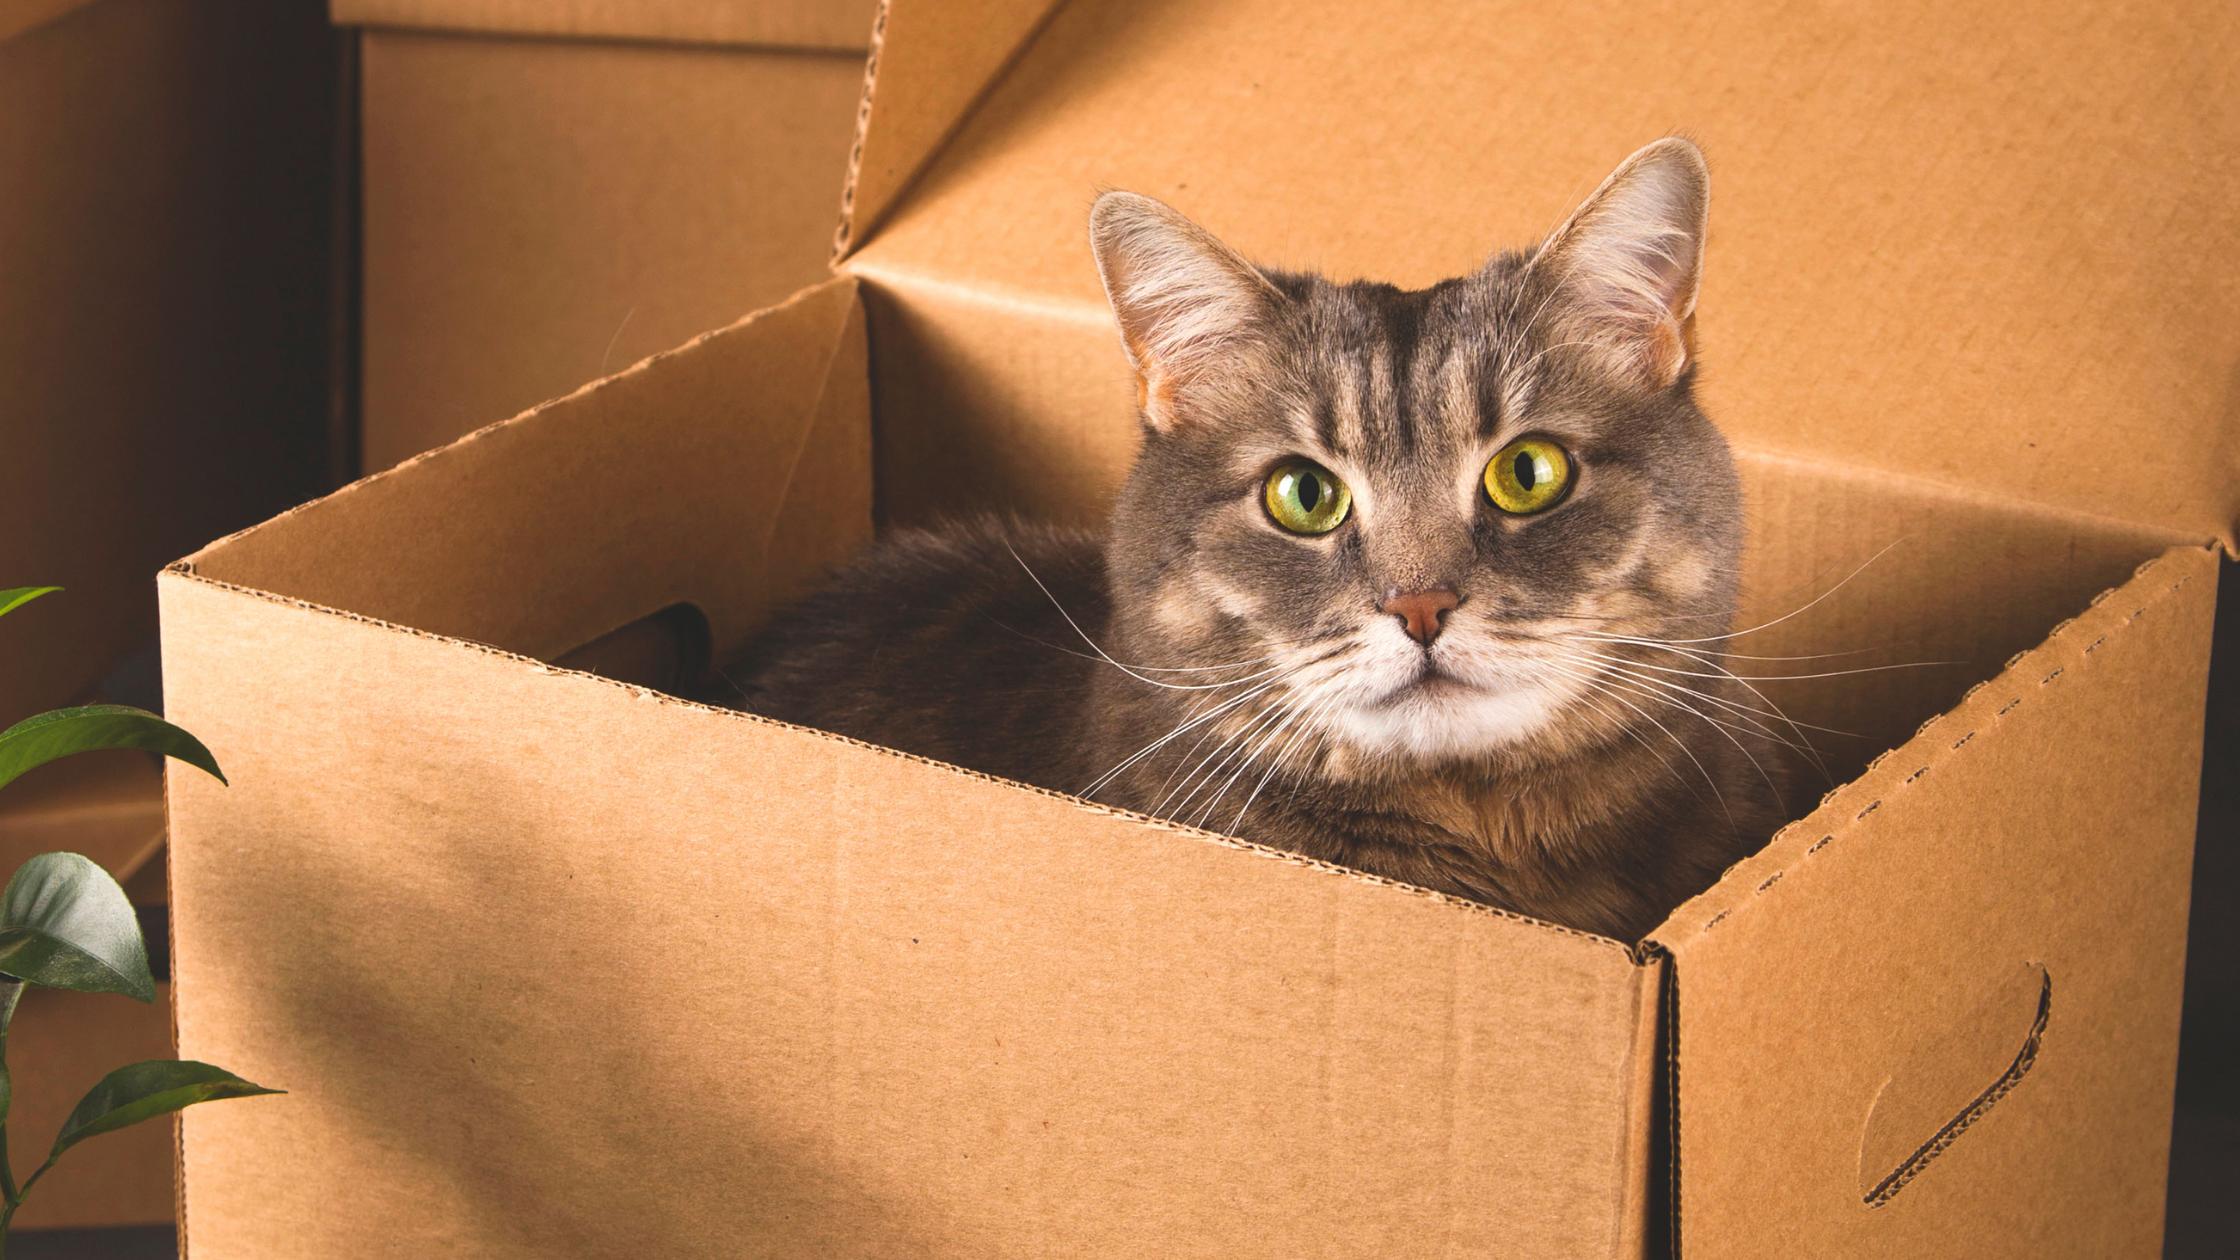 Cat enrichment, feline enrichment, enrichment ideas for cats, natural cat treats, interactive cat toys